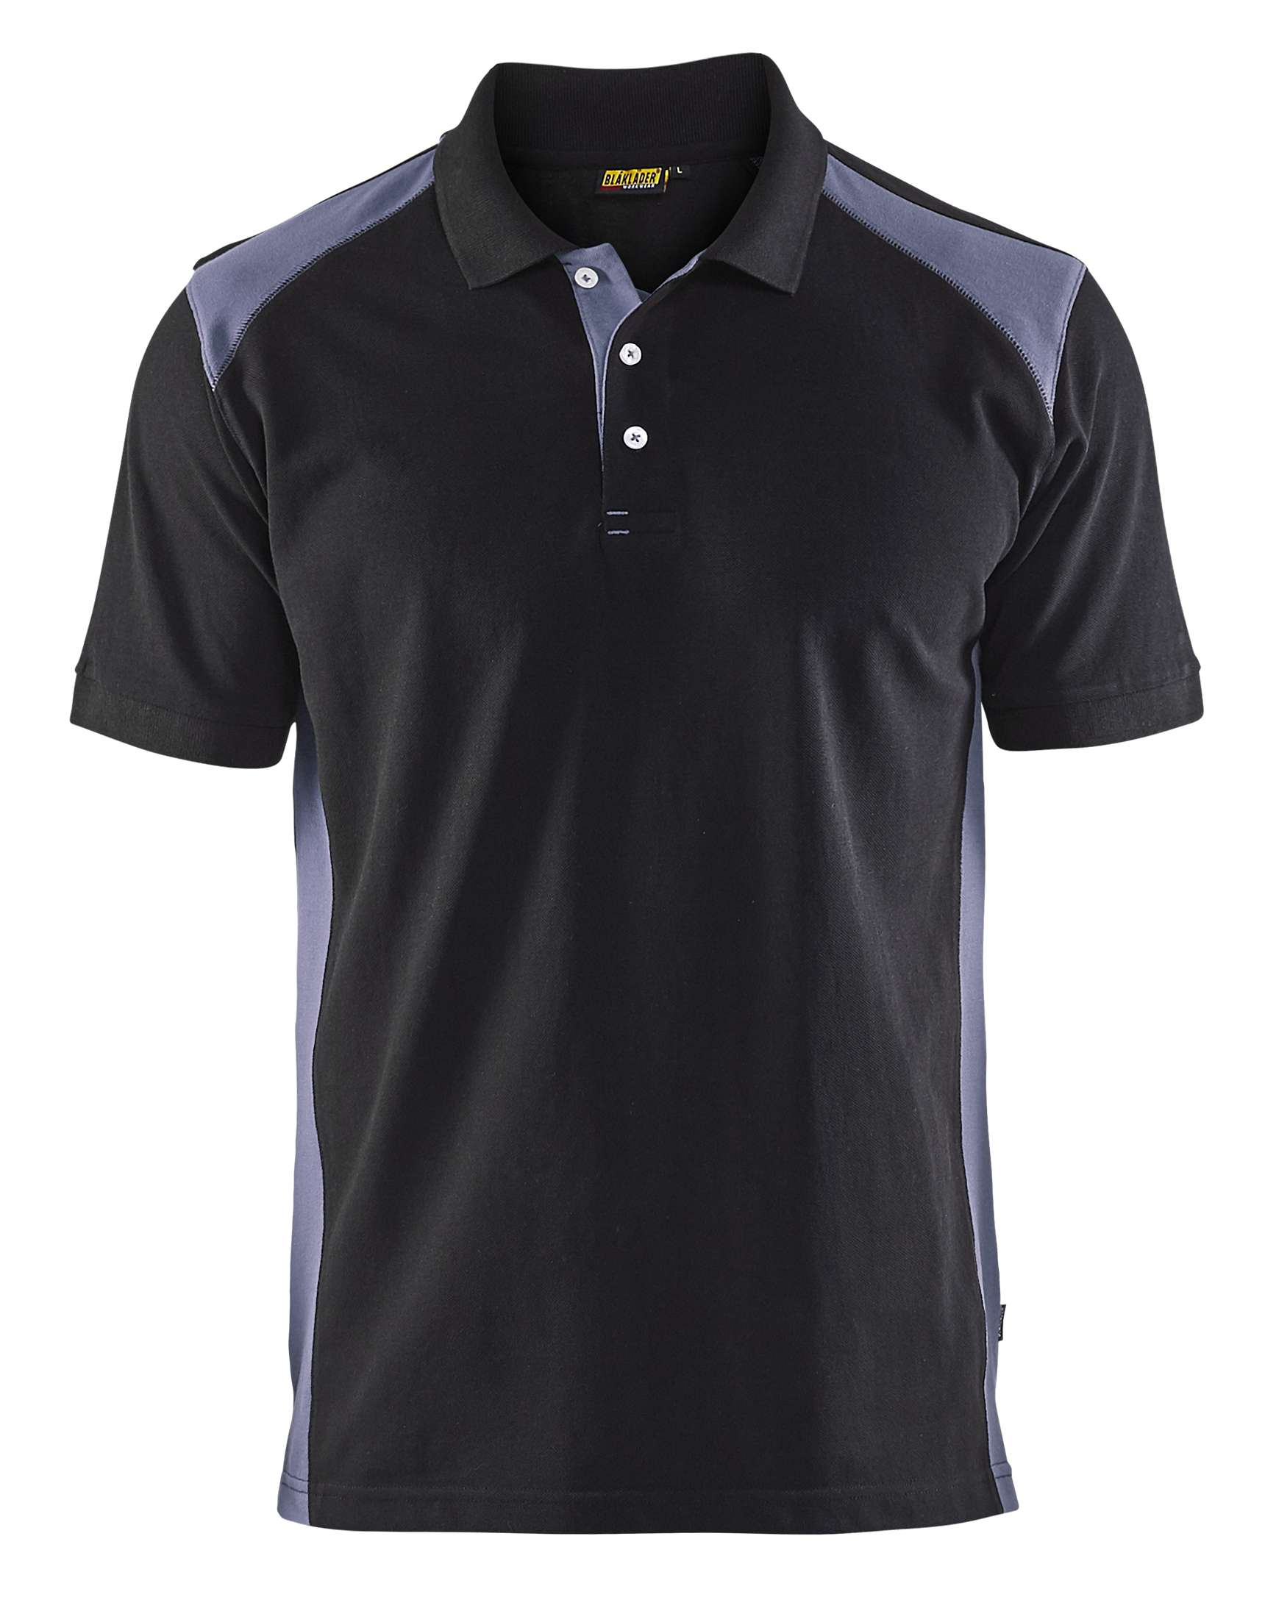 Blaklader Polo shirts 33241050 zwart-grijs(9994)